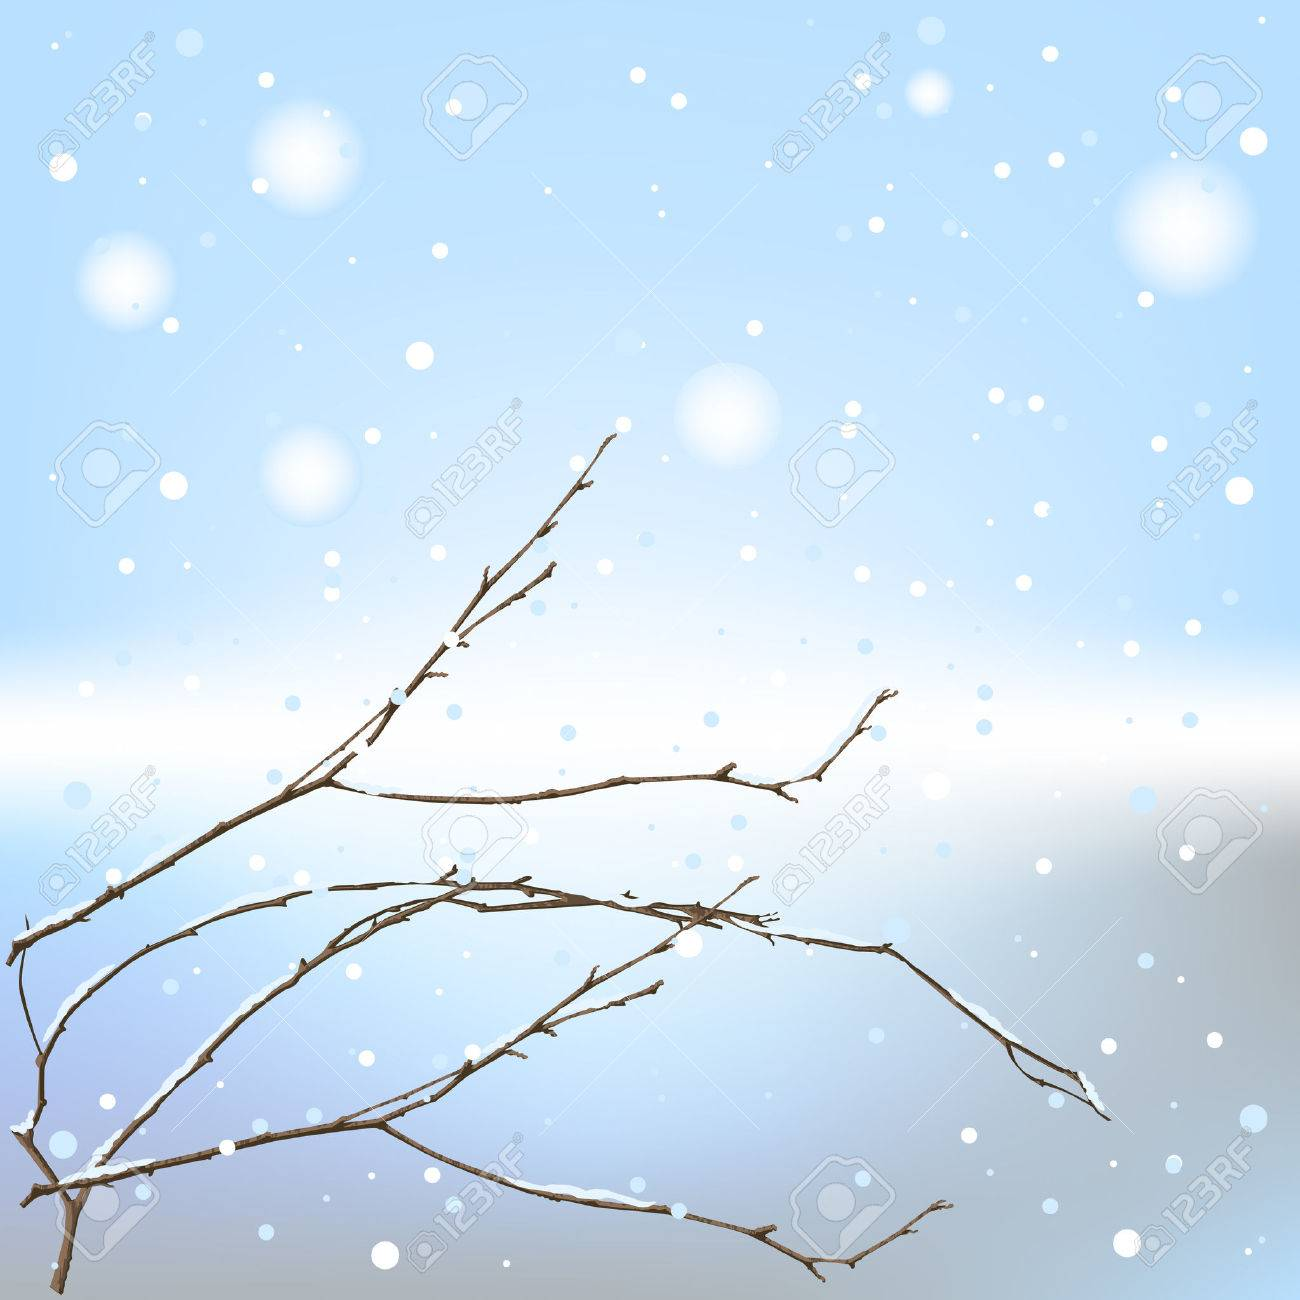 The winter background thread - 8257380